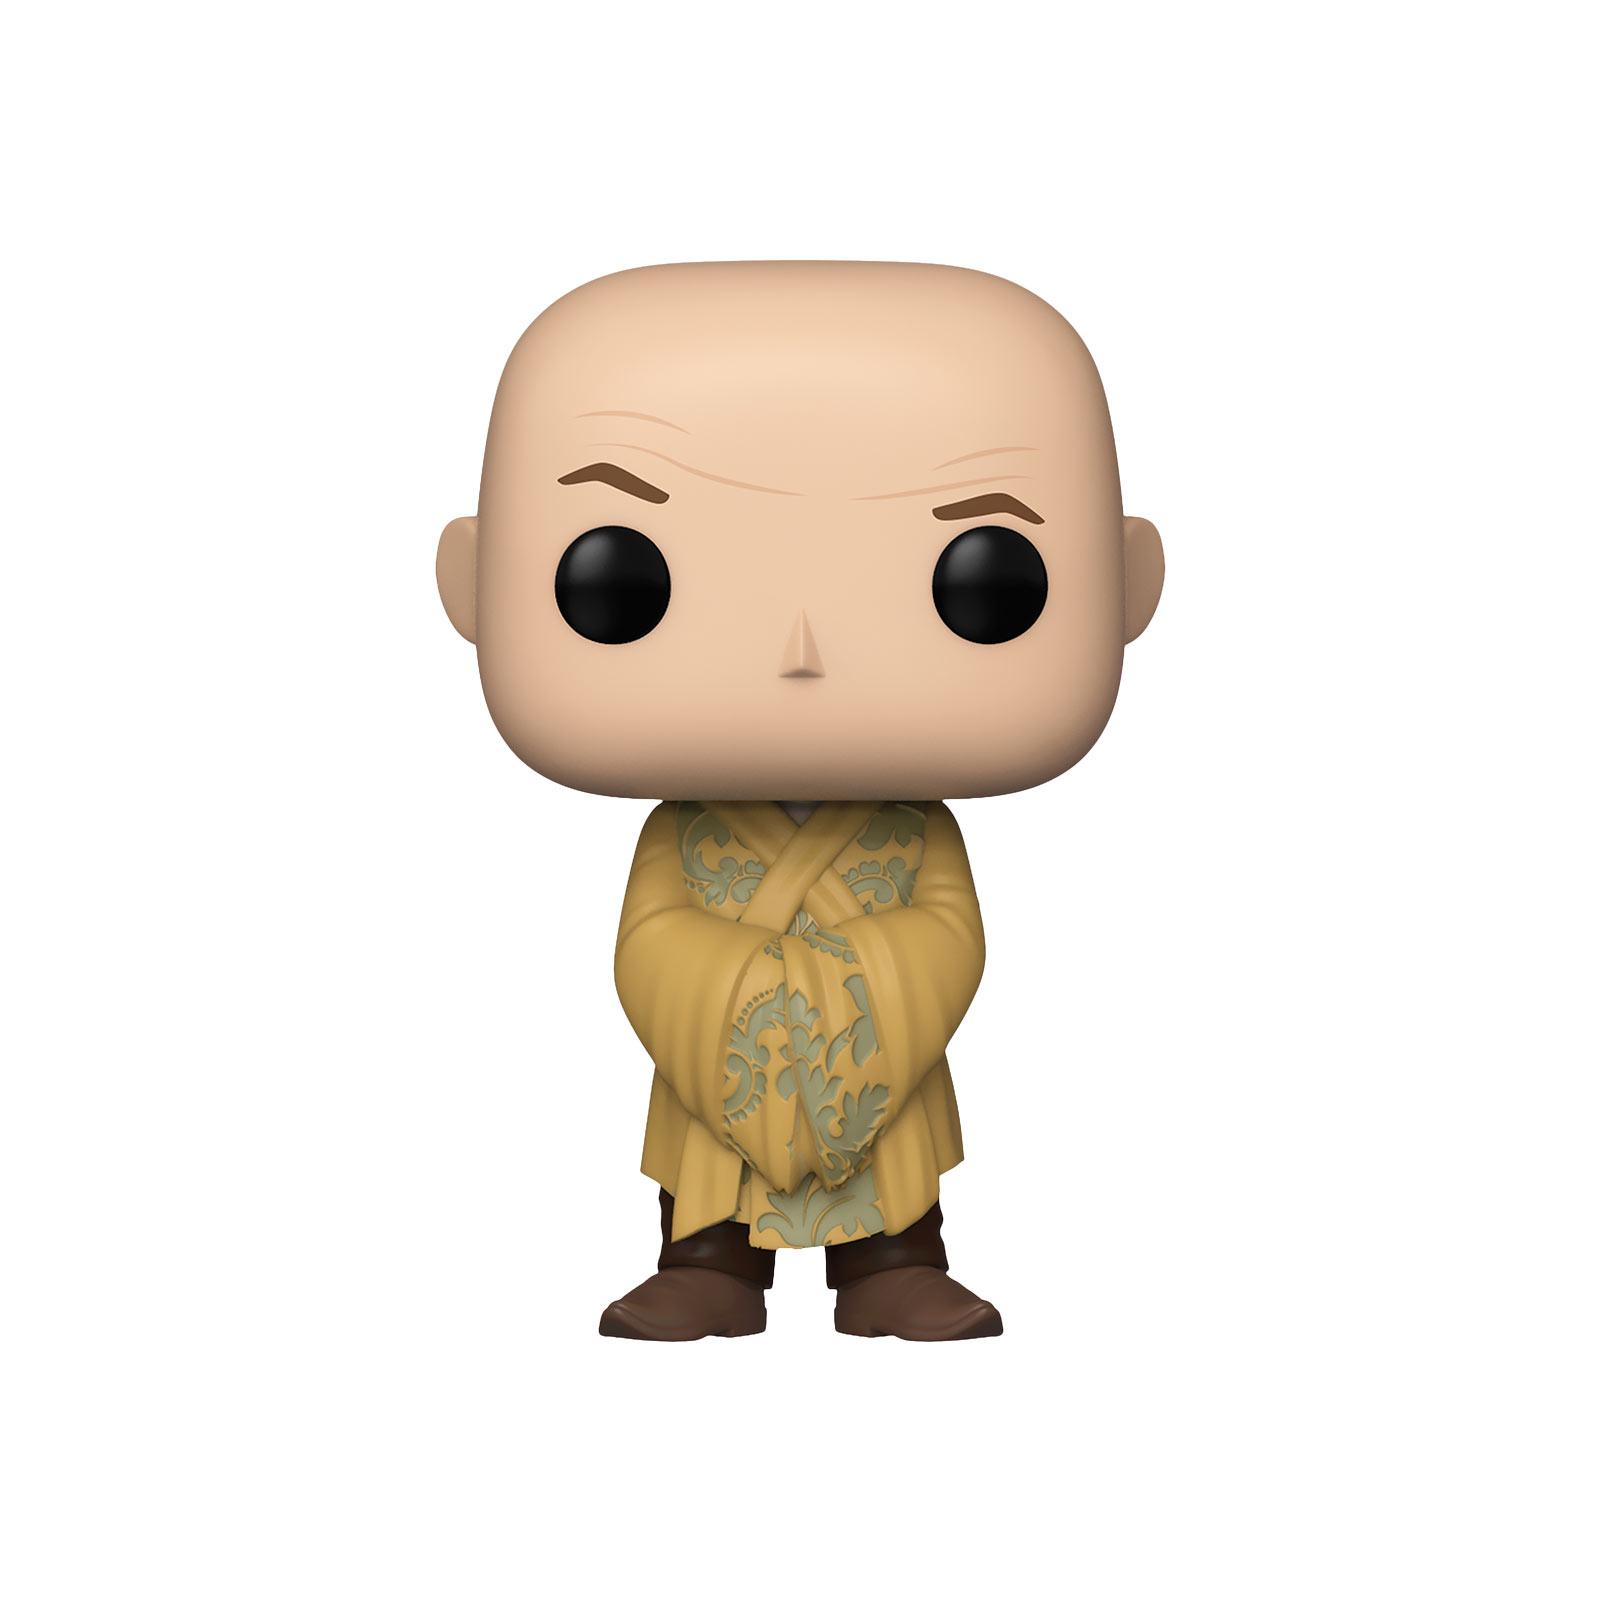 Game of Thrones - Lord Varys Funko Pop Figur